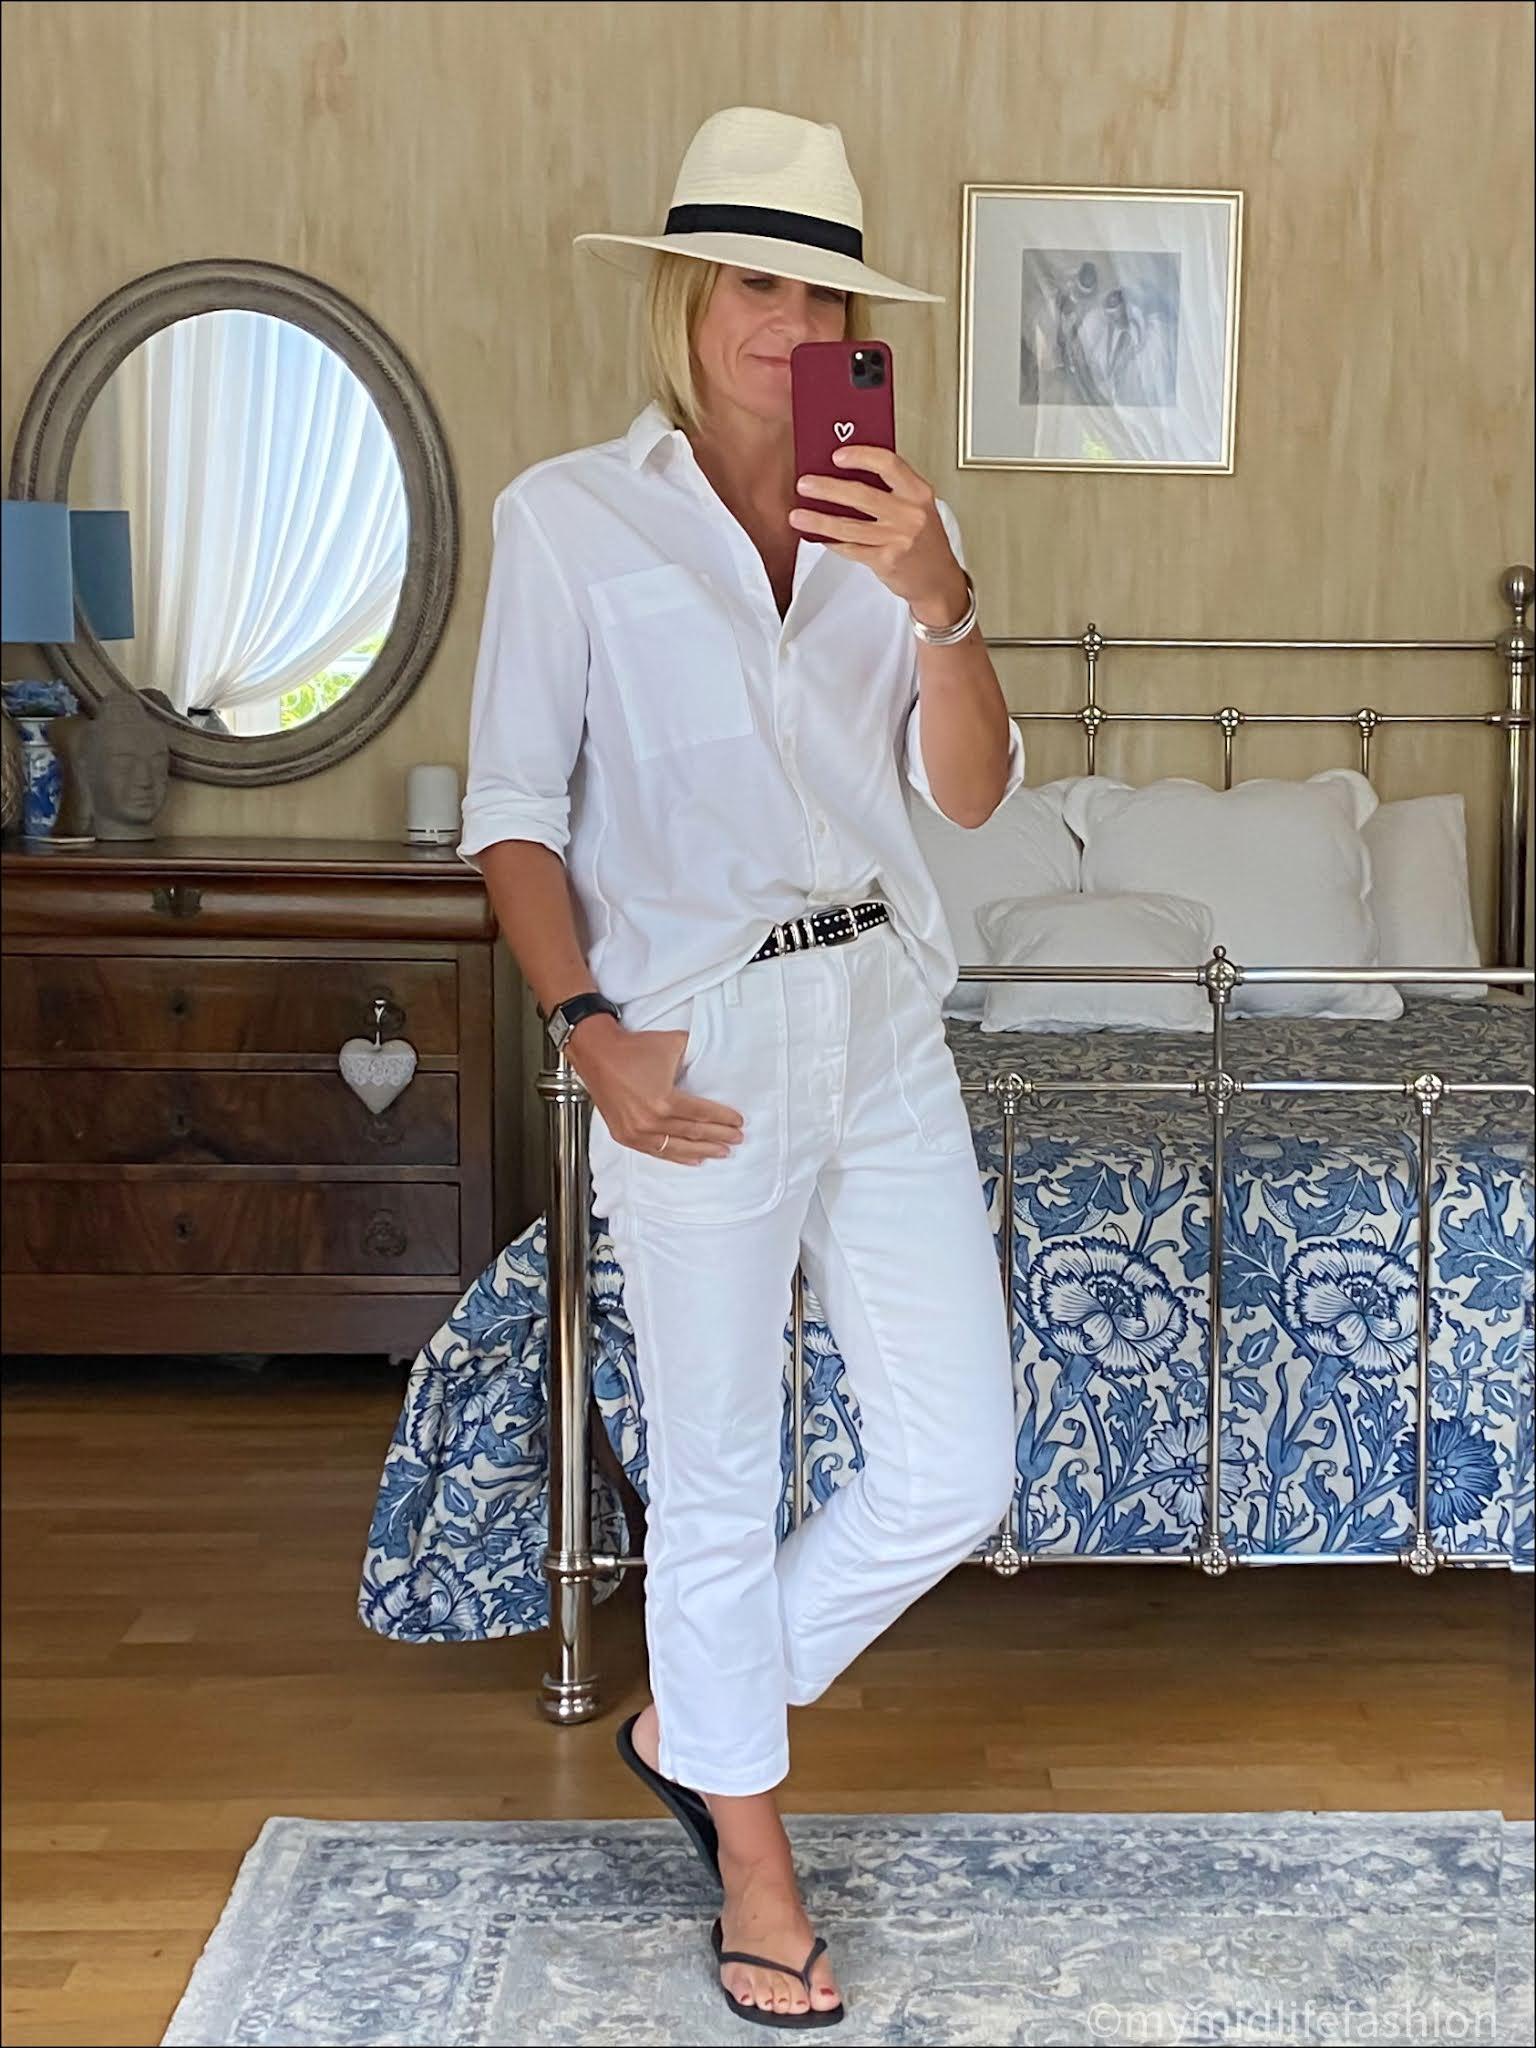 my midlife fashion, Zara Panama sun hat, Baukjen heather organic shirt, the kooples leather studded belt, j crew cropped straight leg jeans, havaianas slim fit flip flops